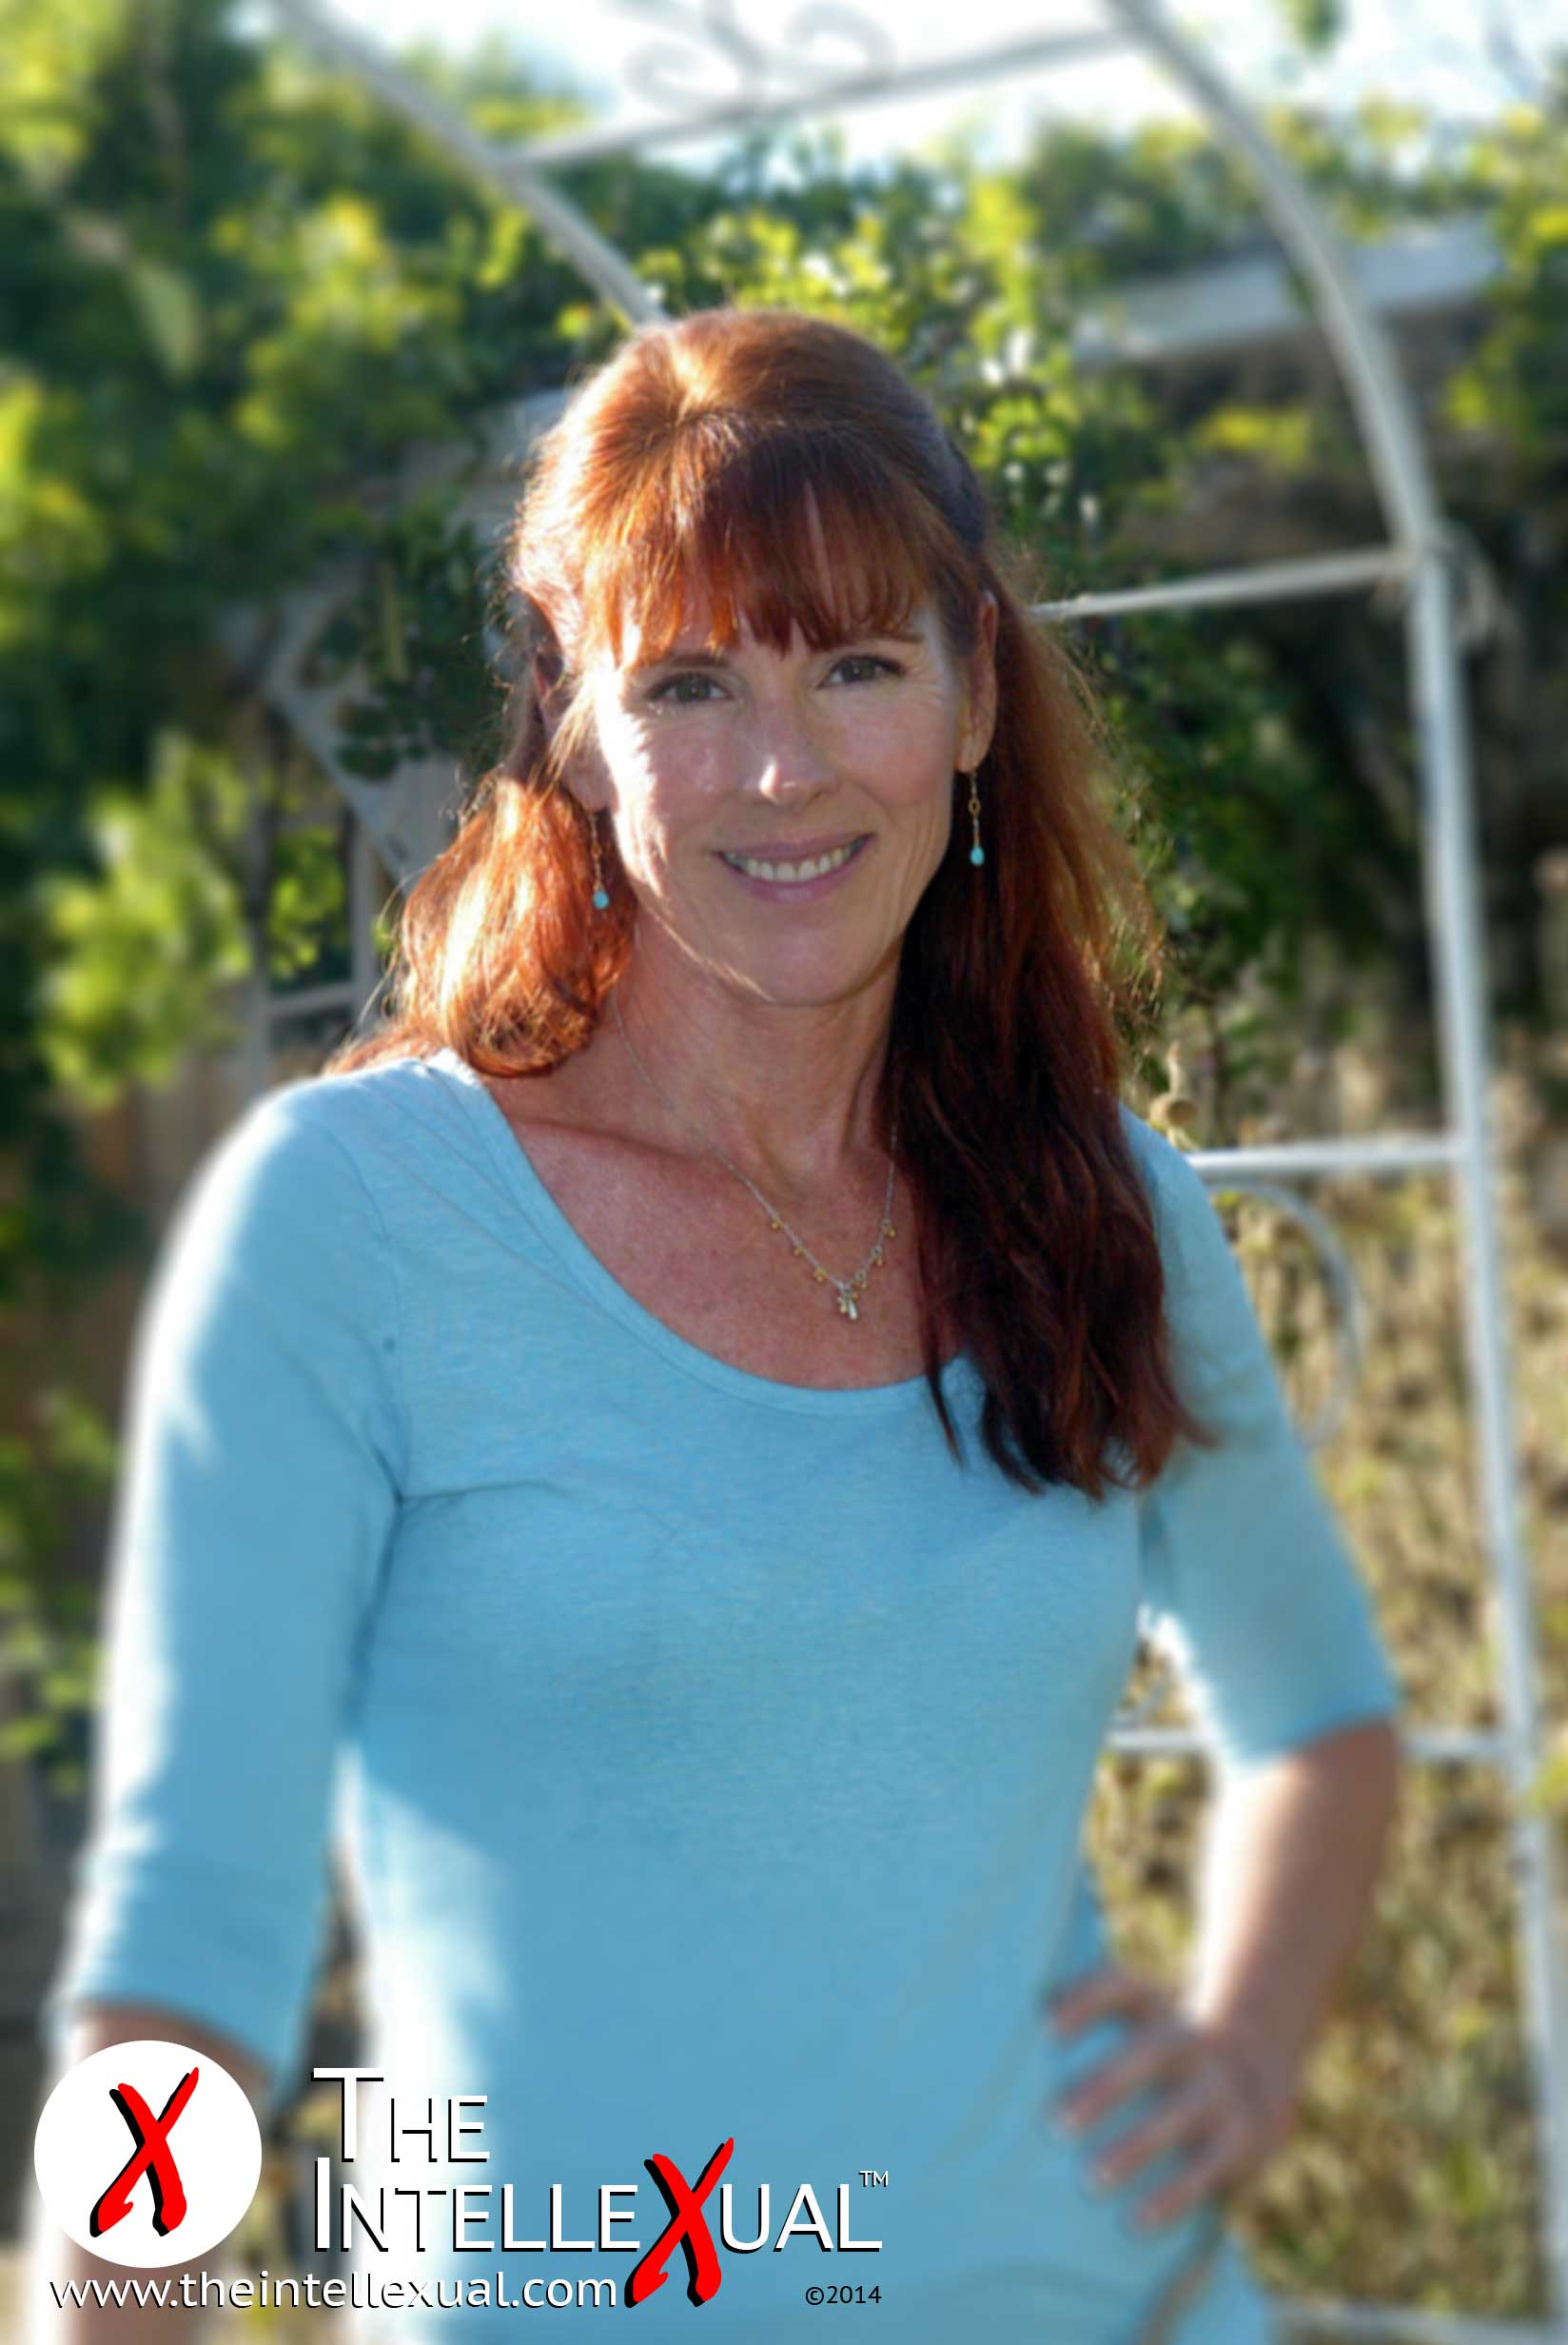 Discussion on this topic: Kristen Meadows, patricia-tallman/